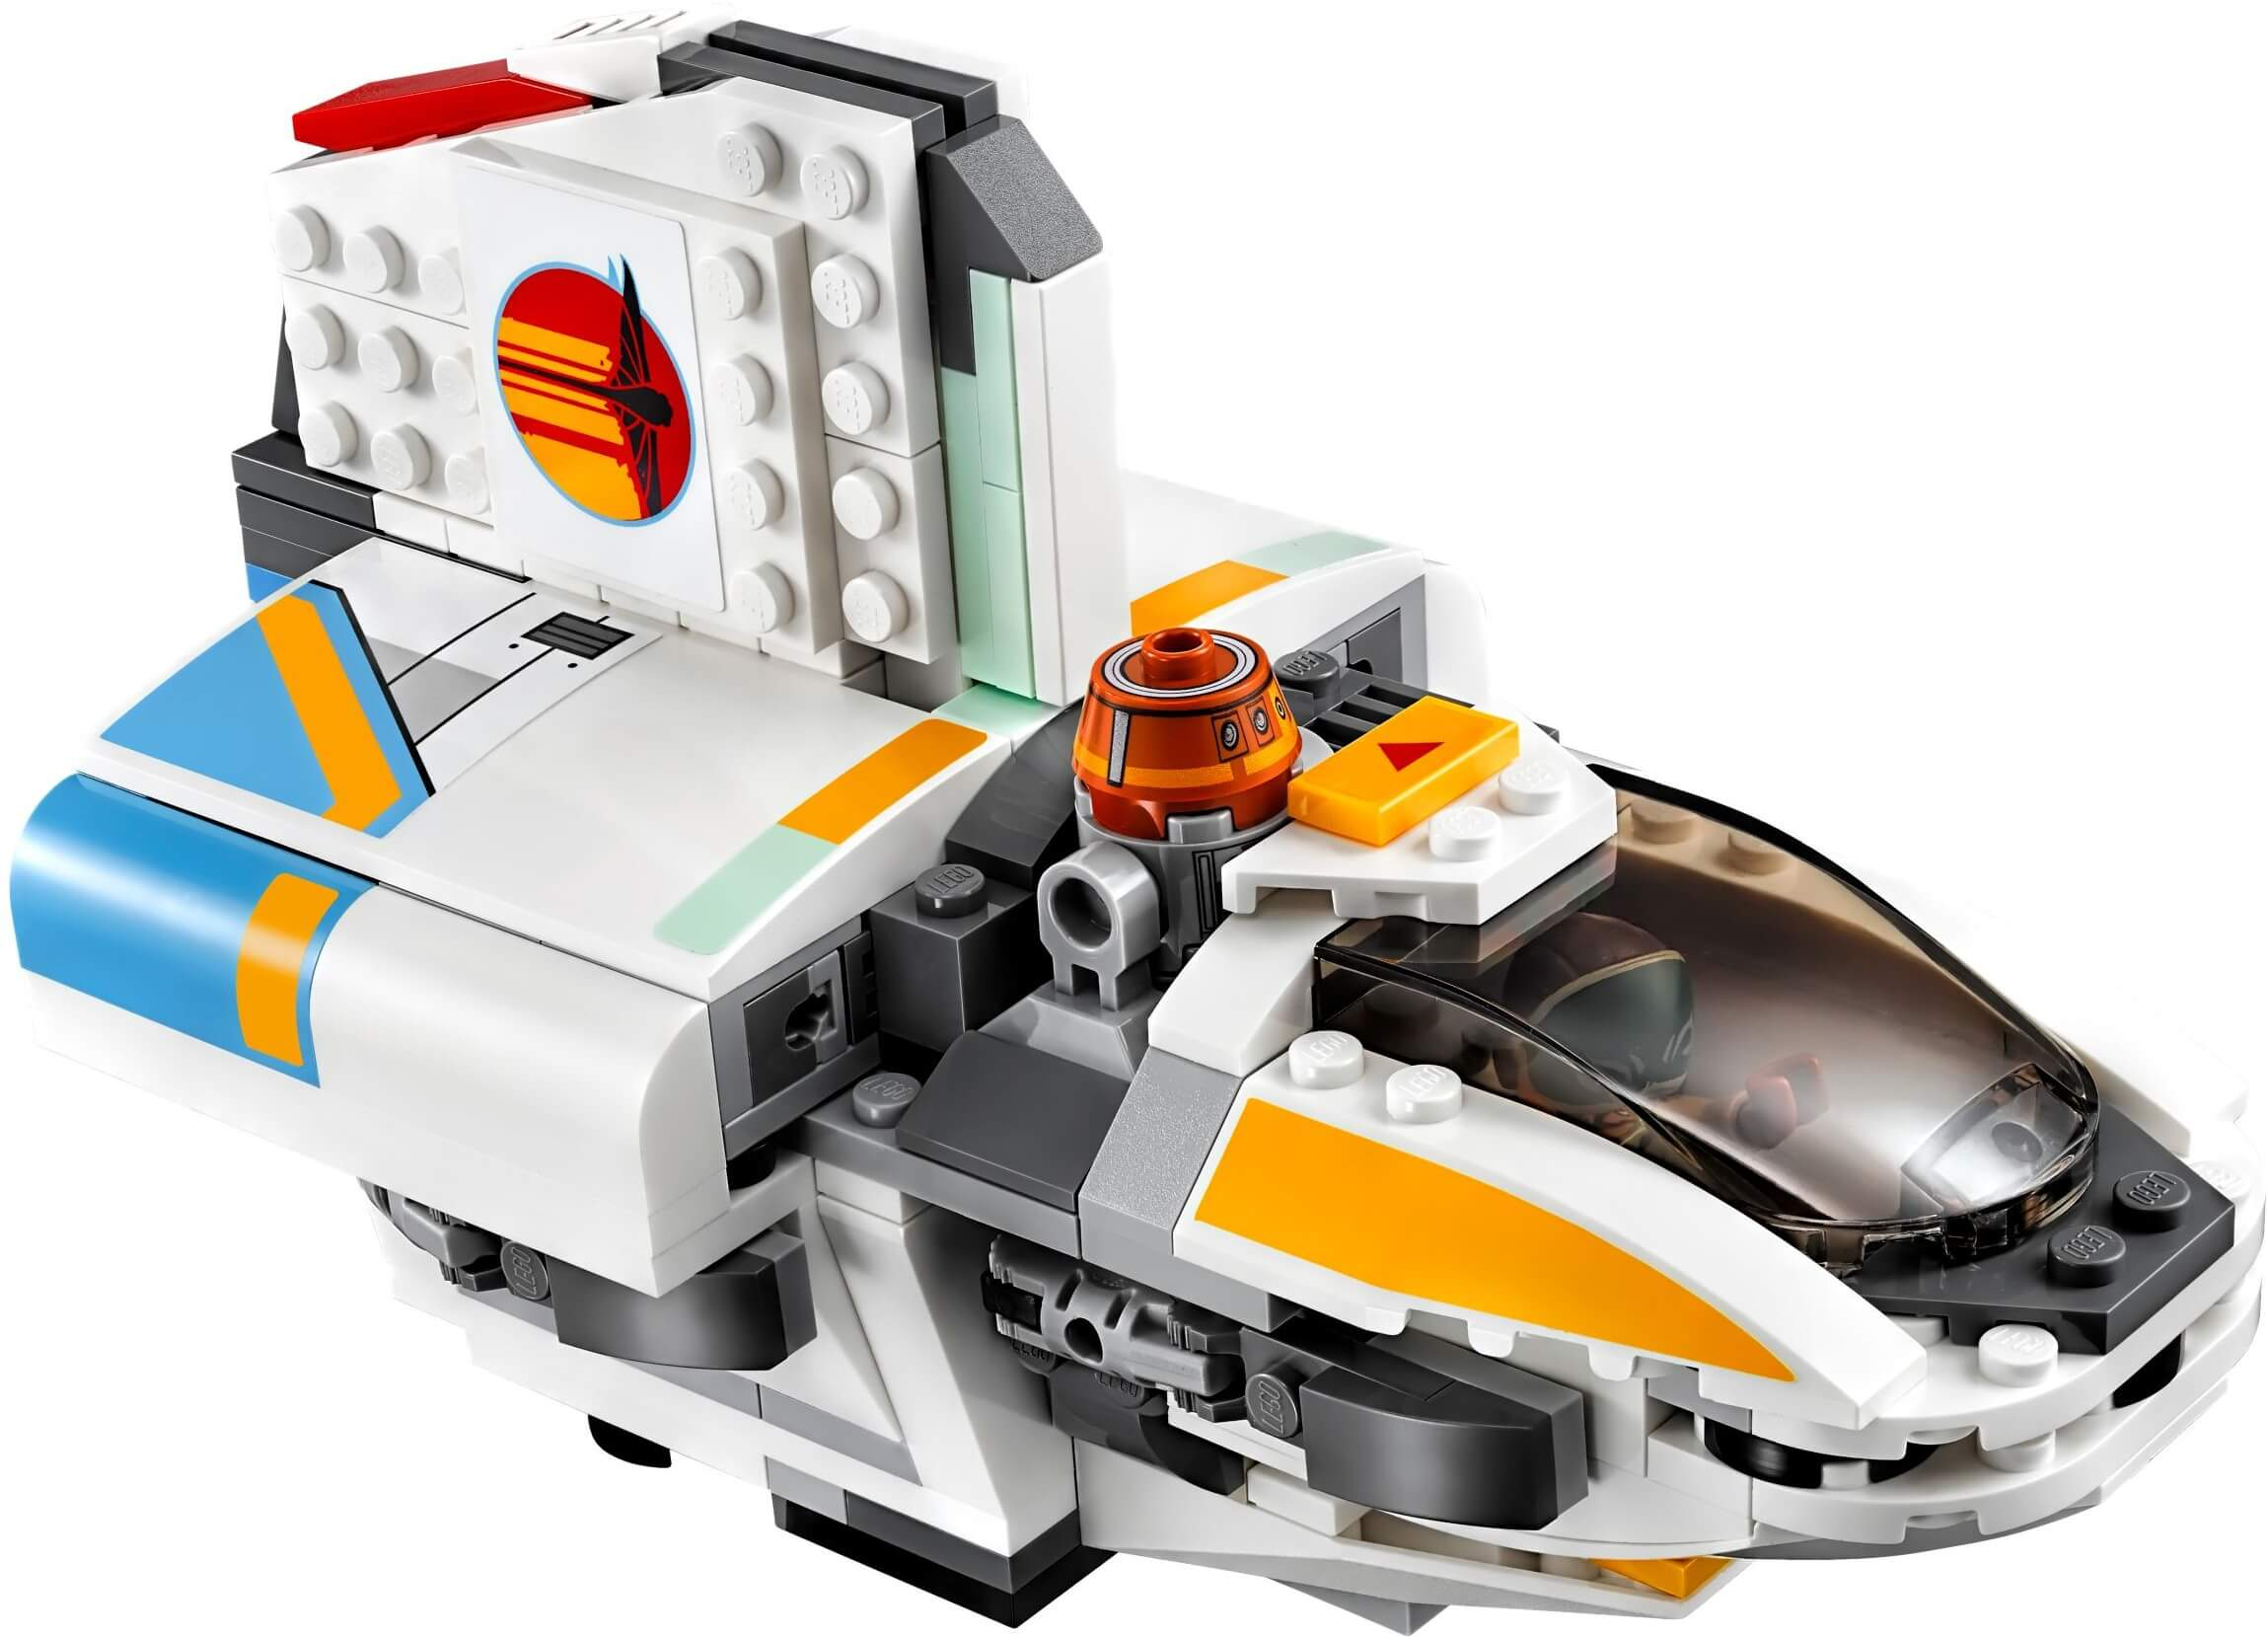 Mua đồ chơi LEGO 75170 - LEGO Star Wars 75170 - Phi Thuyền Bóng Ma (LEGO 75170 The Phantom)